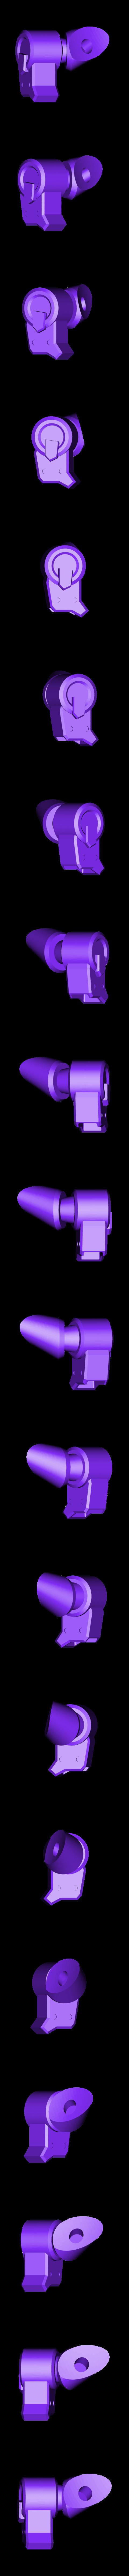 Thigh-RightFront.stl Download STL file Hammond's Wrecking Ball Mech from Overwatch • 3D printer template, FunbieStudios